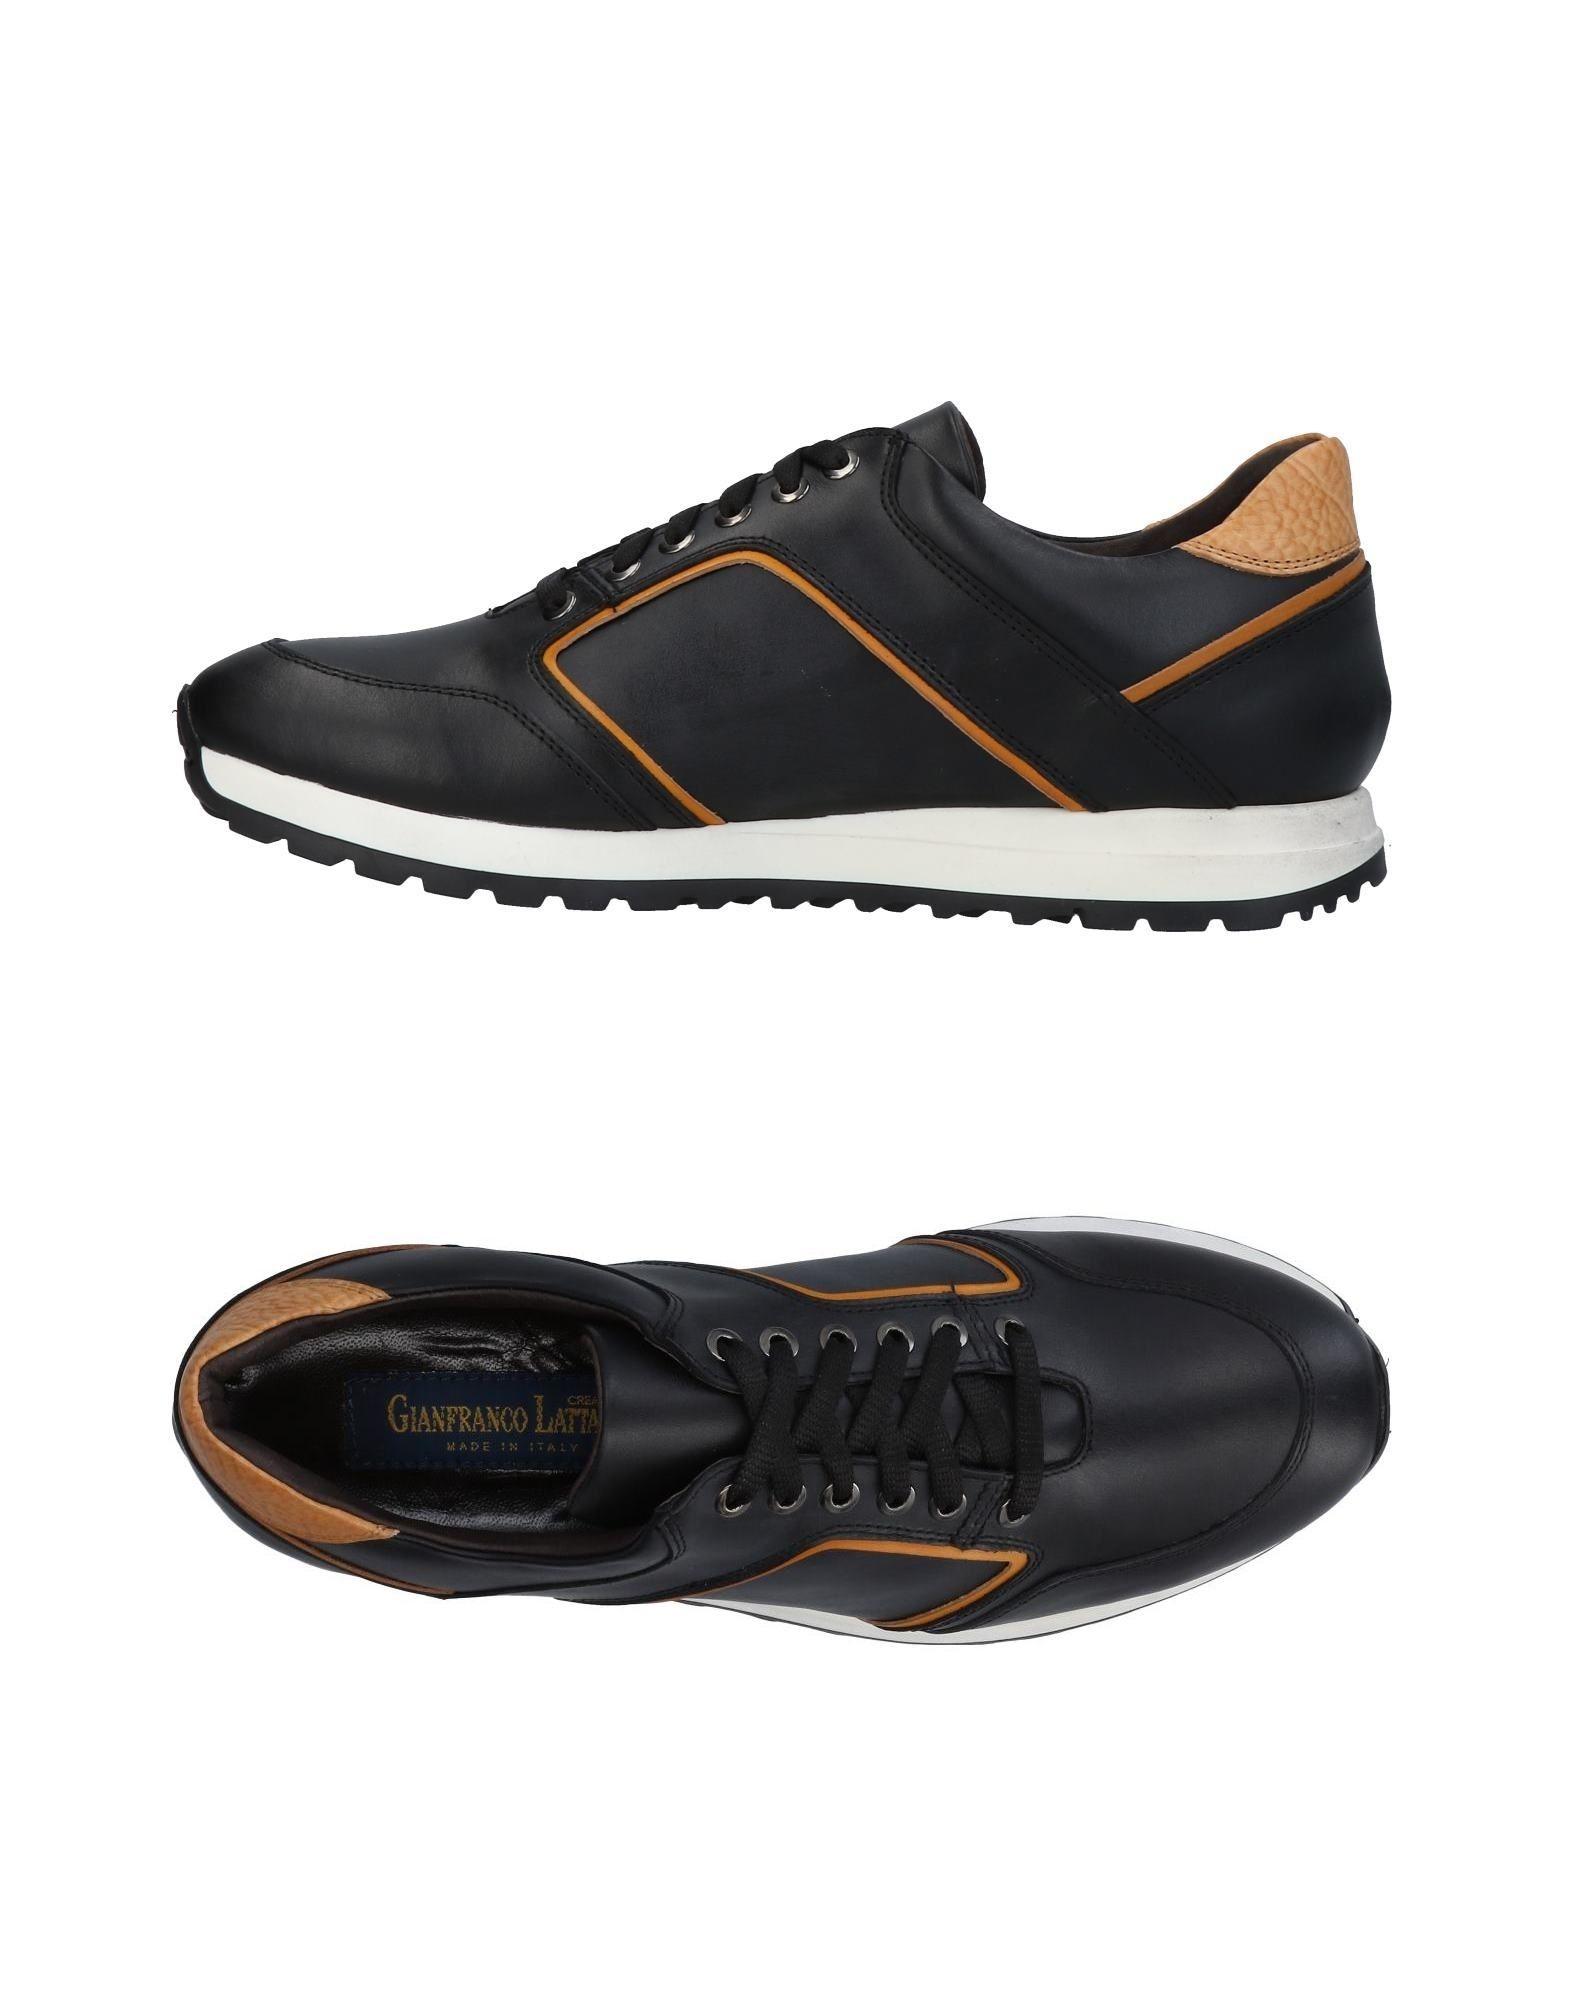 Sneakers Gianfranco Lattanzi Homme - Sneakers Gianfranco Lattanzi  Noir Dédouanement saisonnier